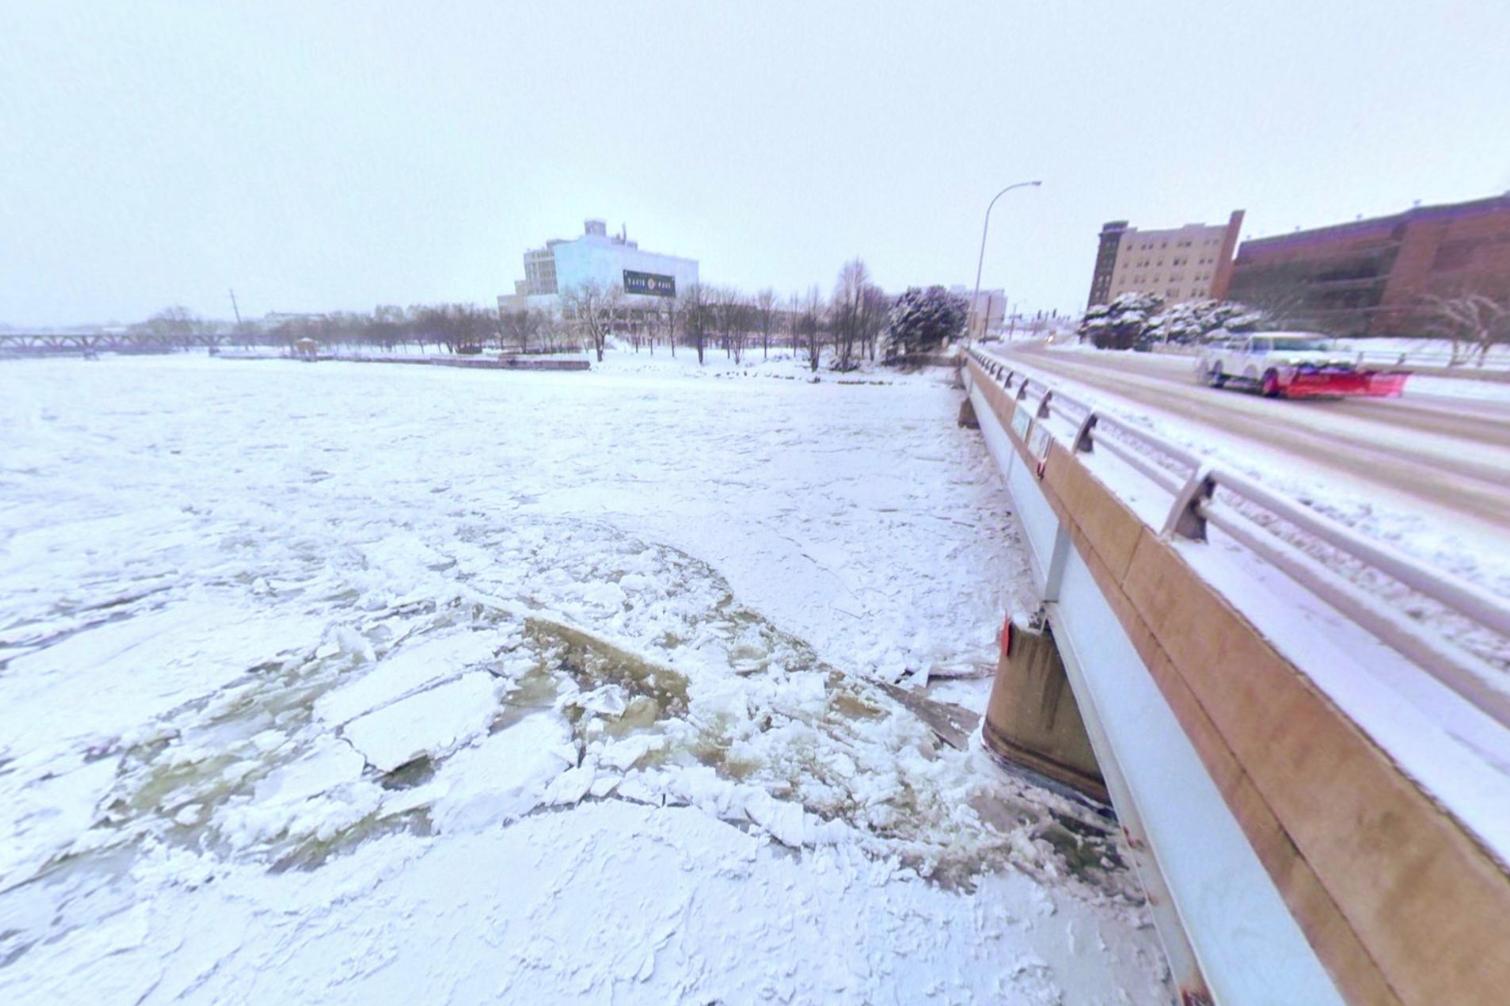 The Rock River freezes under the Chestnut Street bridge on Friday, Jan. 25, 2019, in Rockford. [SCOTT P. YATES/   RRSTAR.COM    STAFF]